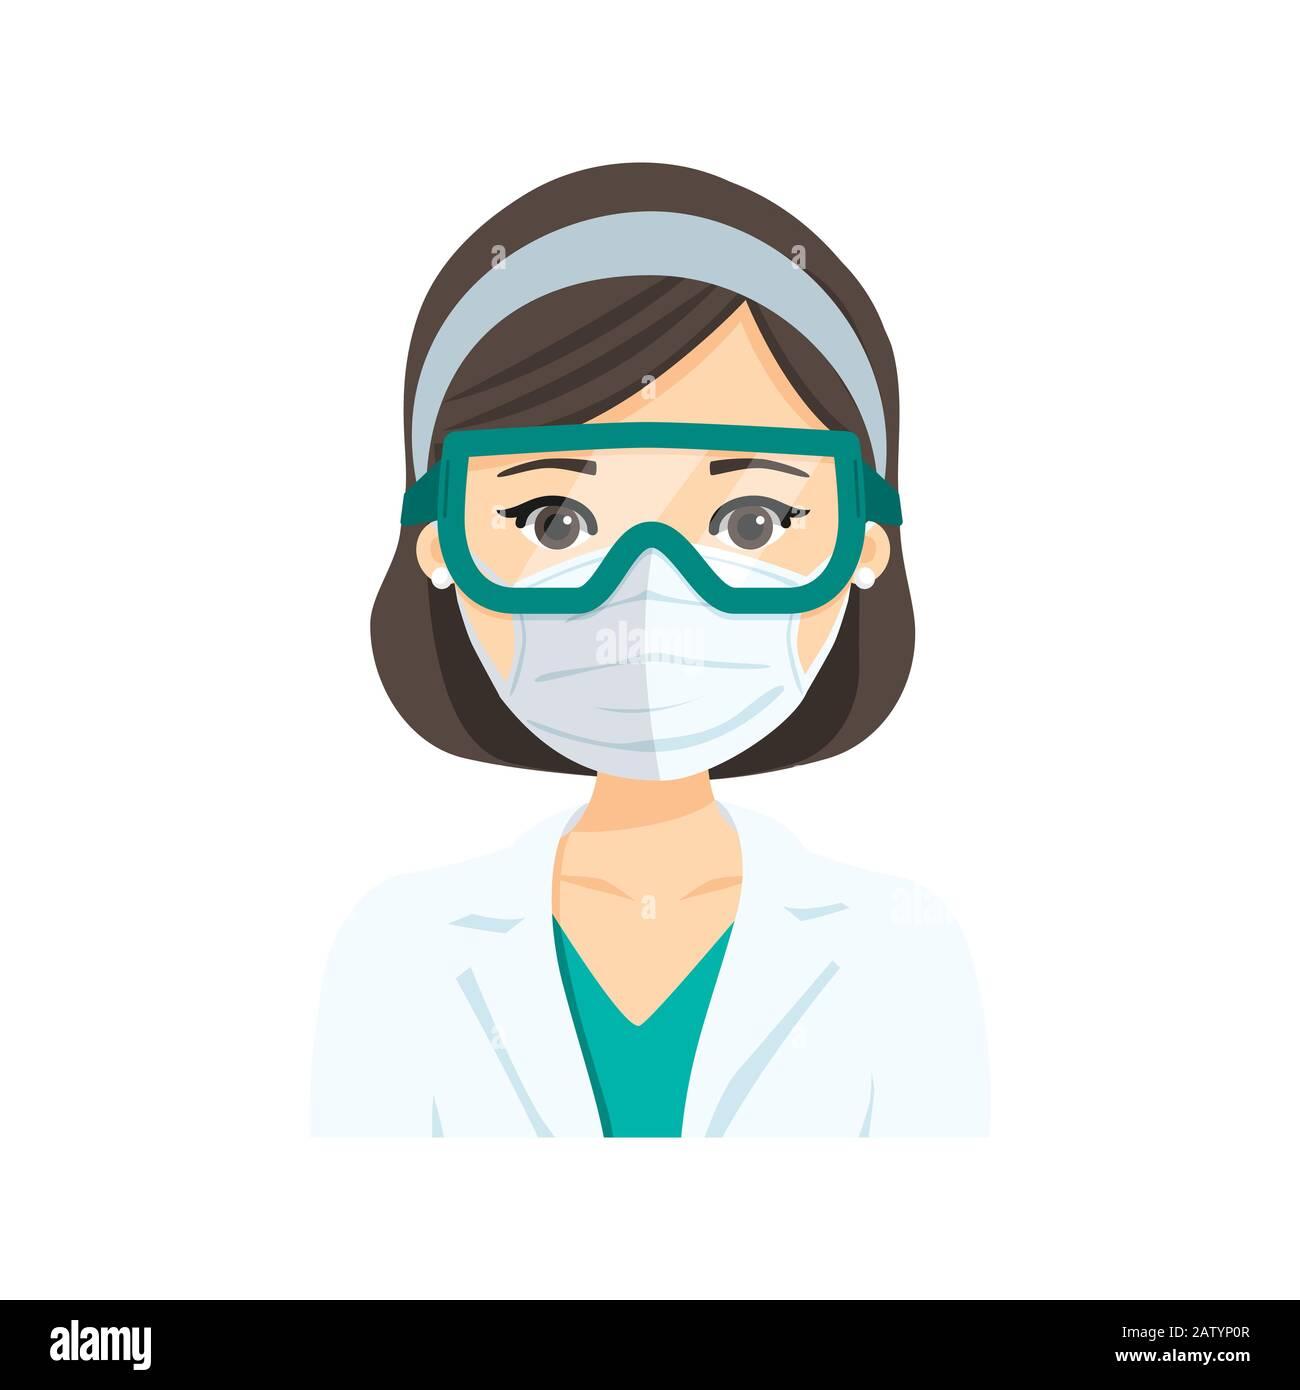 maschera per medico n95